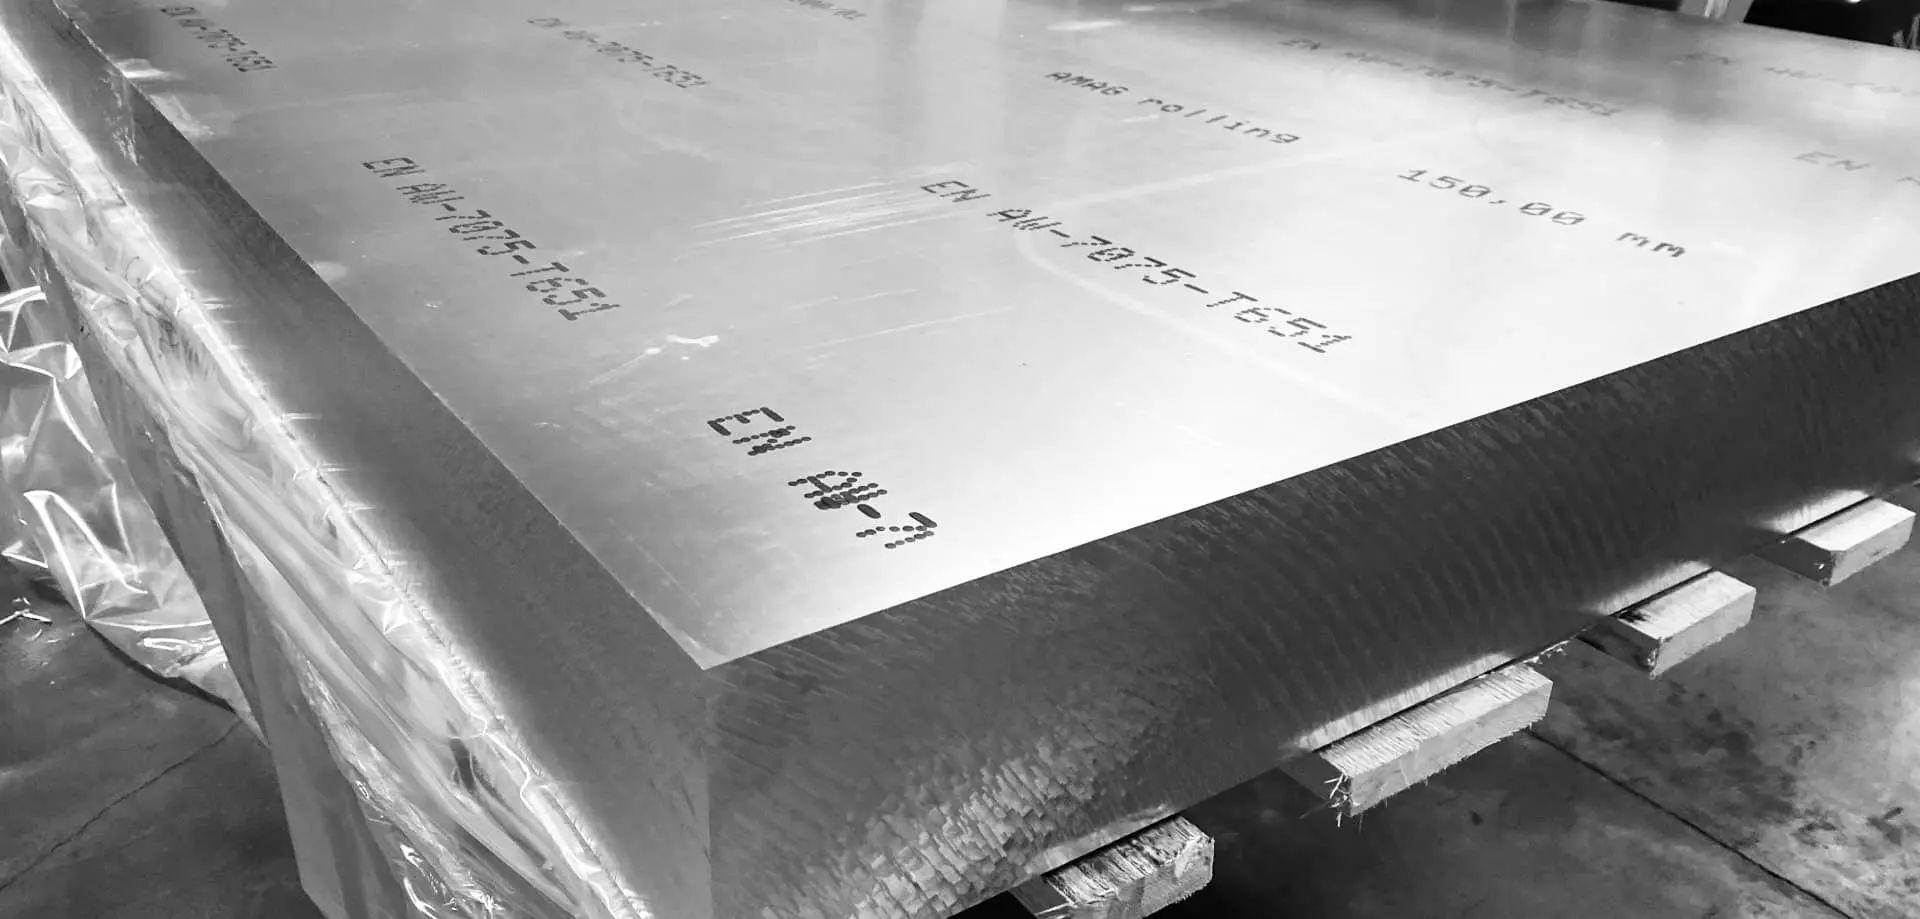 Aluminium Plates and Plain Metal Sheets